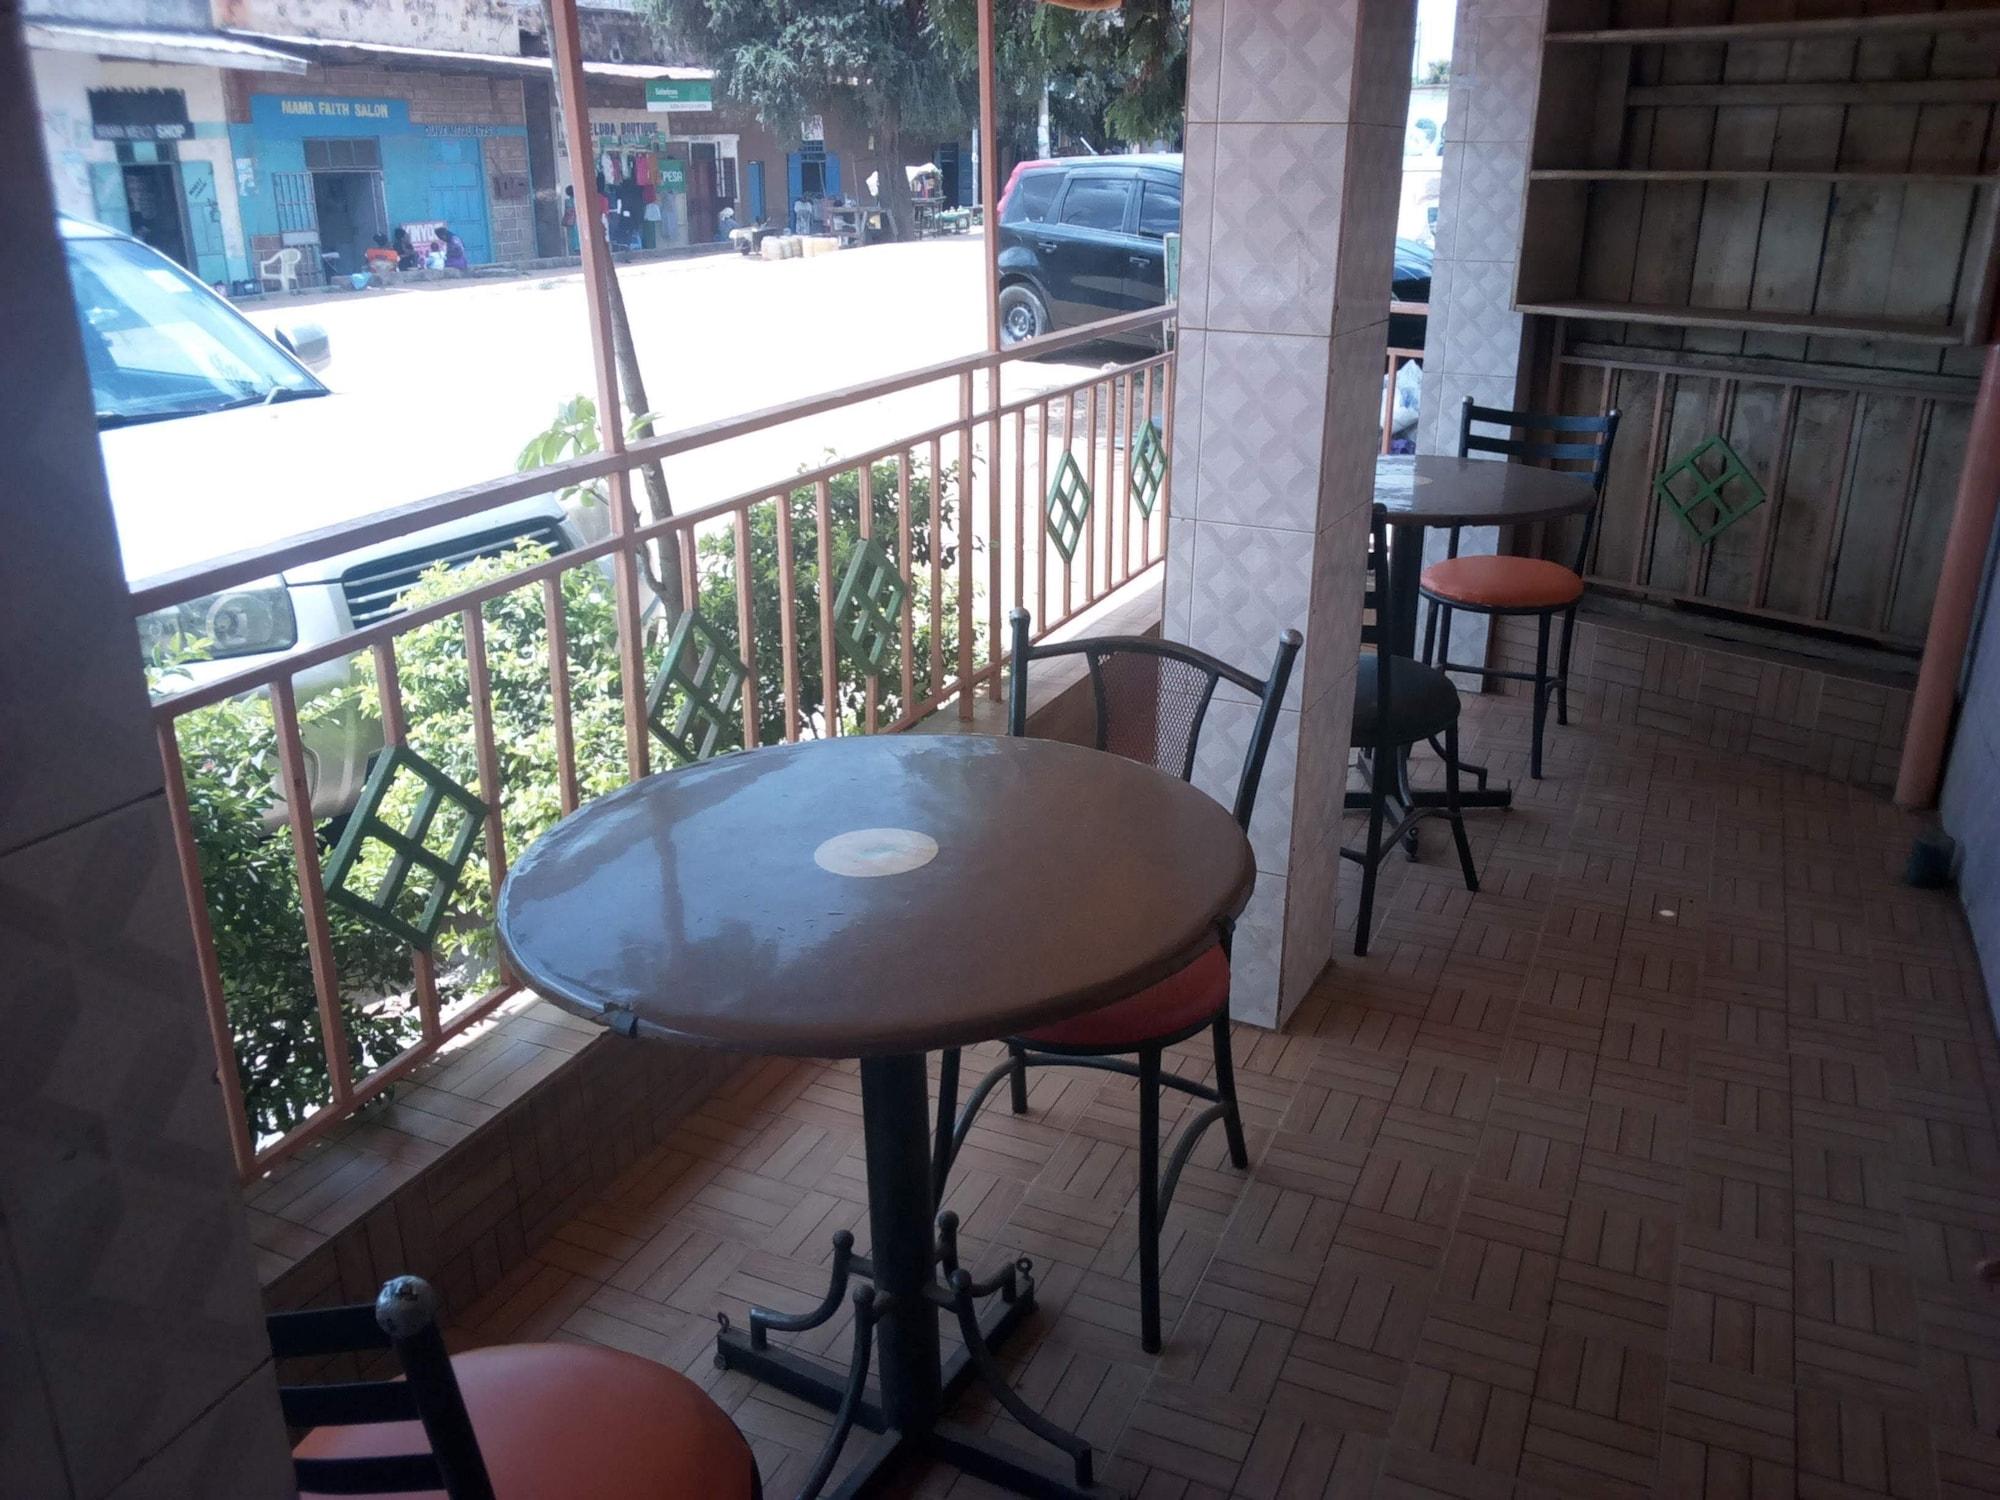 Pivot Restaurant And Lodge, Mwingi Central